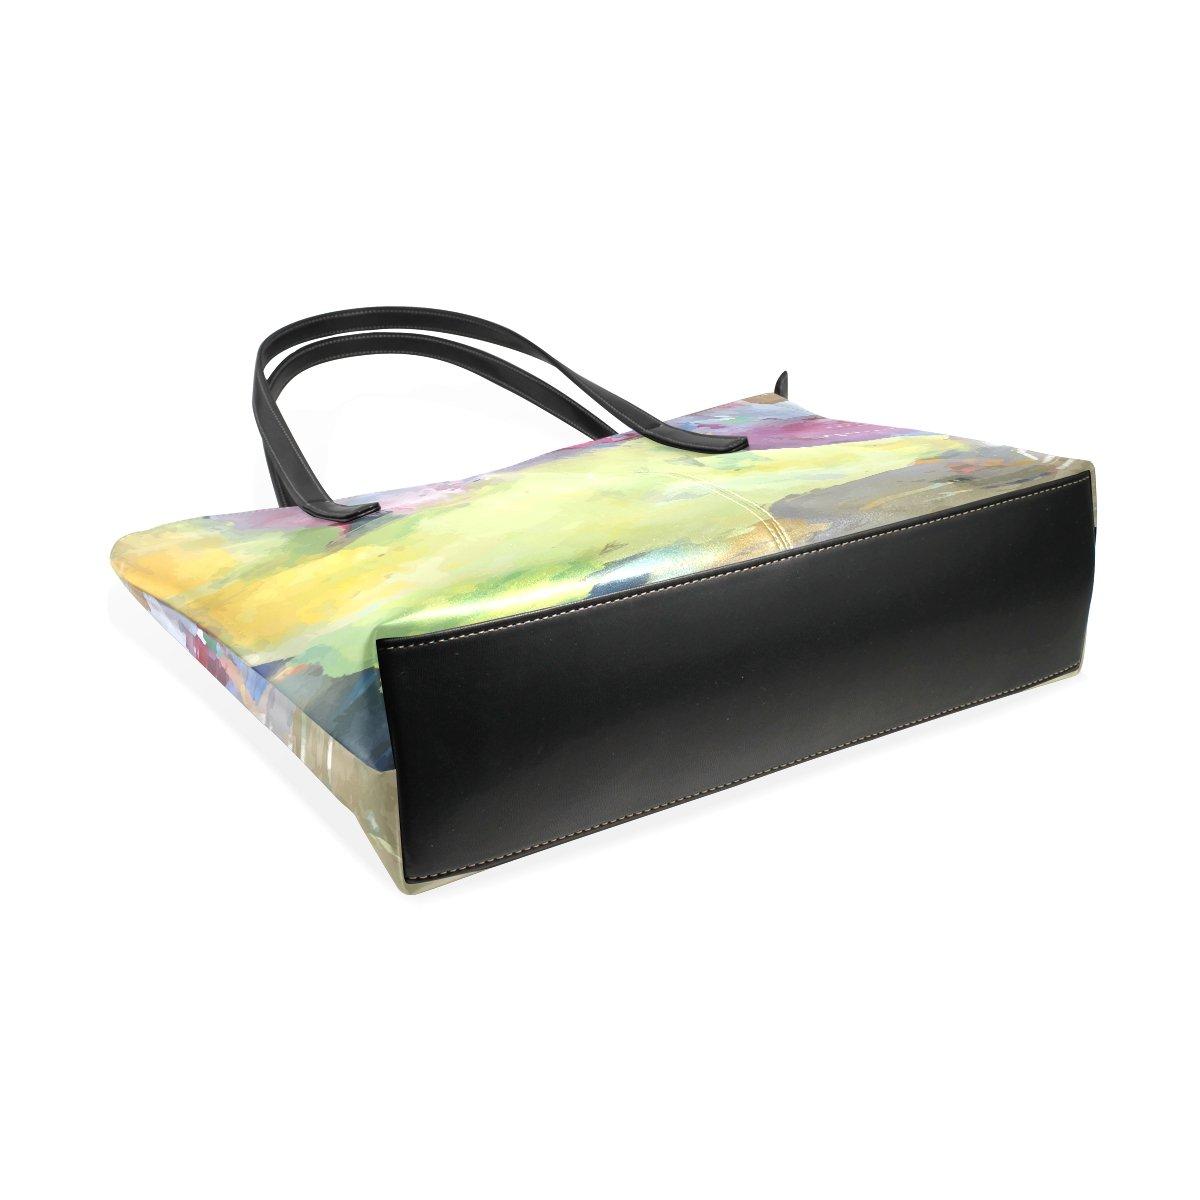 Womens Leather Top Handle Shoulder Handbag Oil Painting Large Work Tote Bag